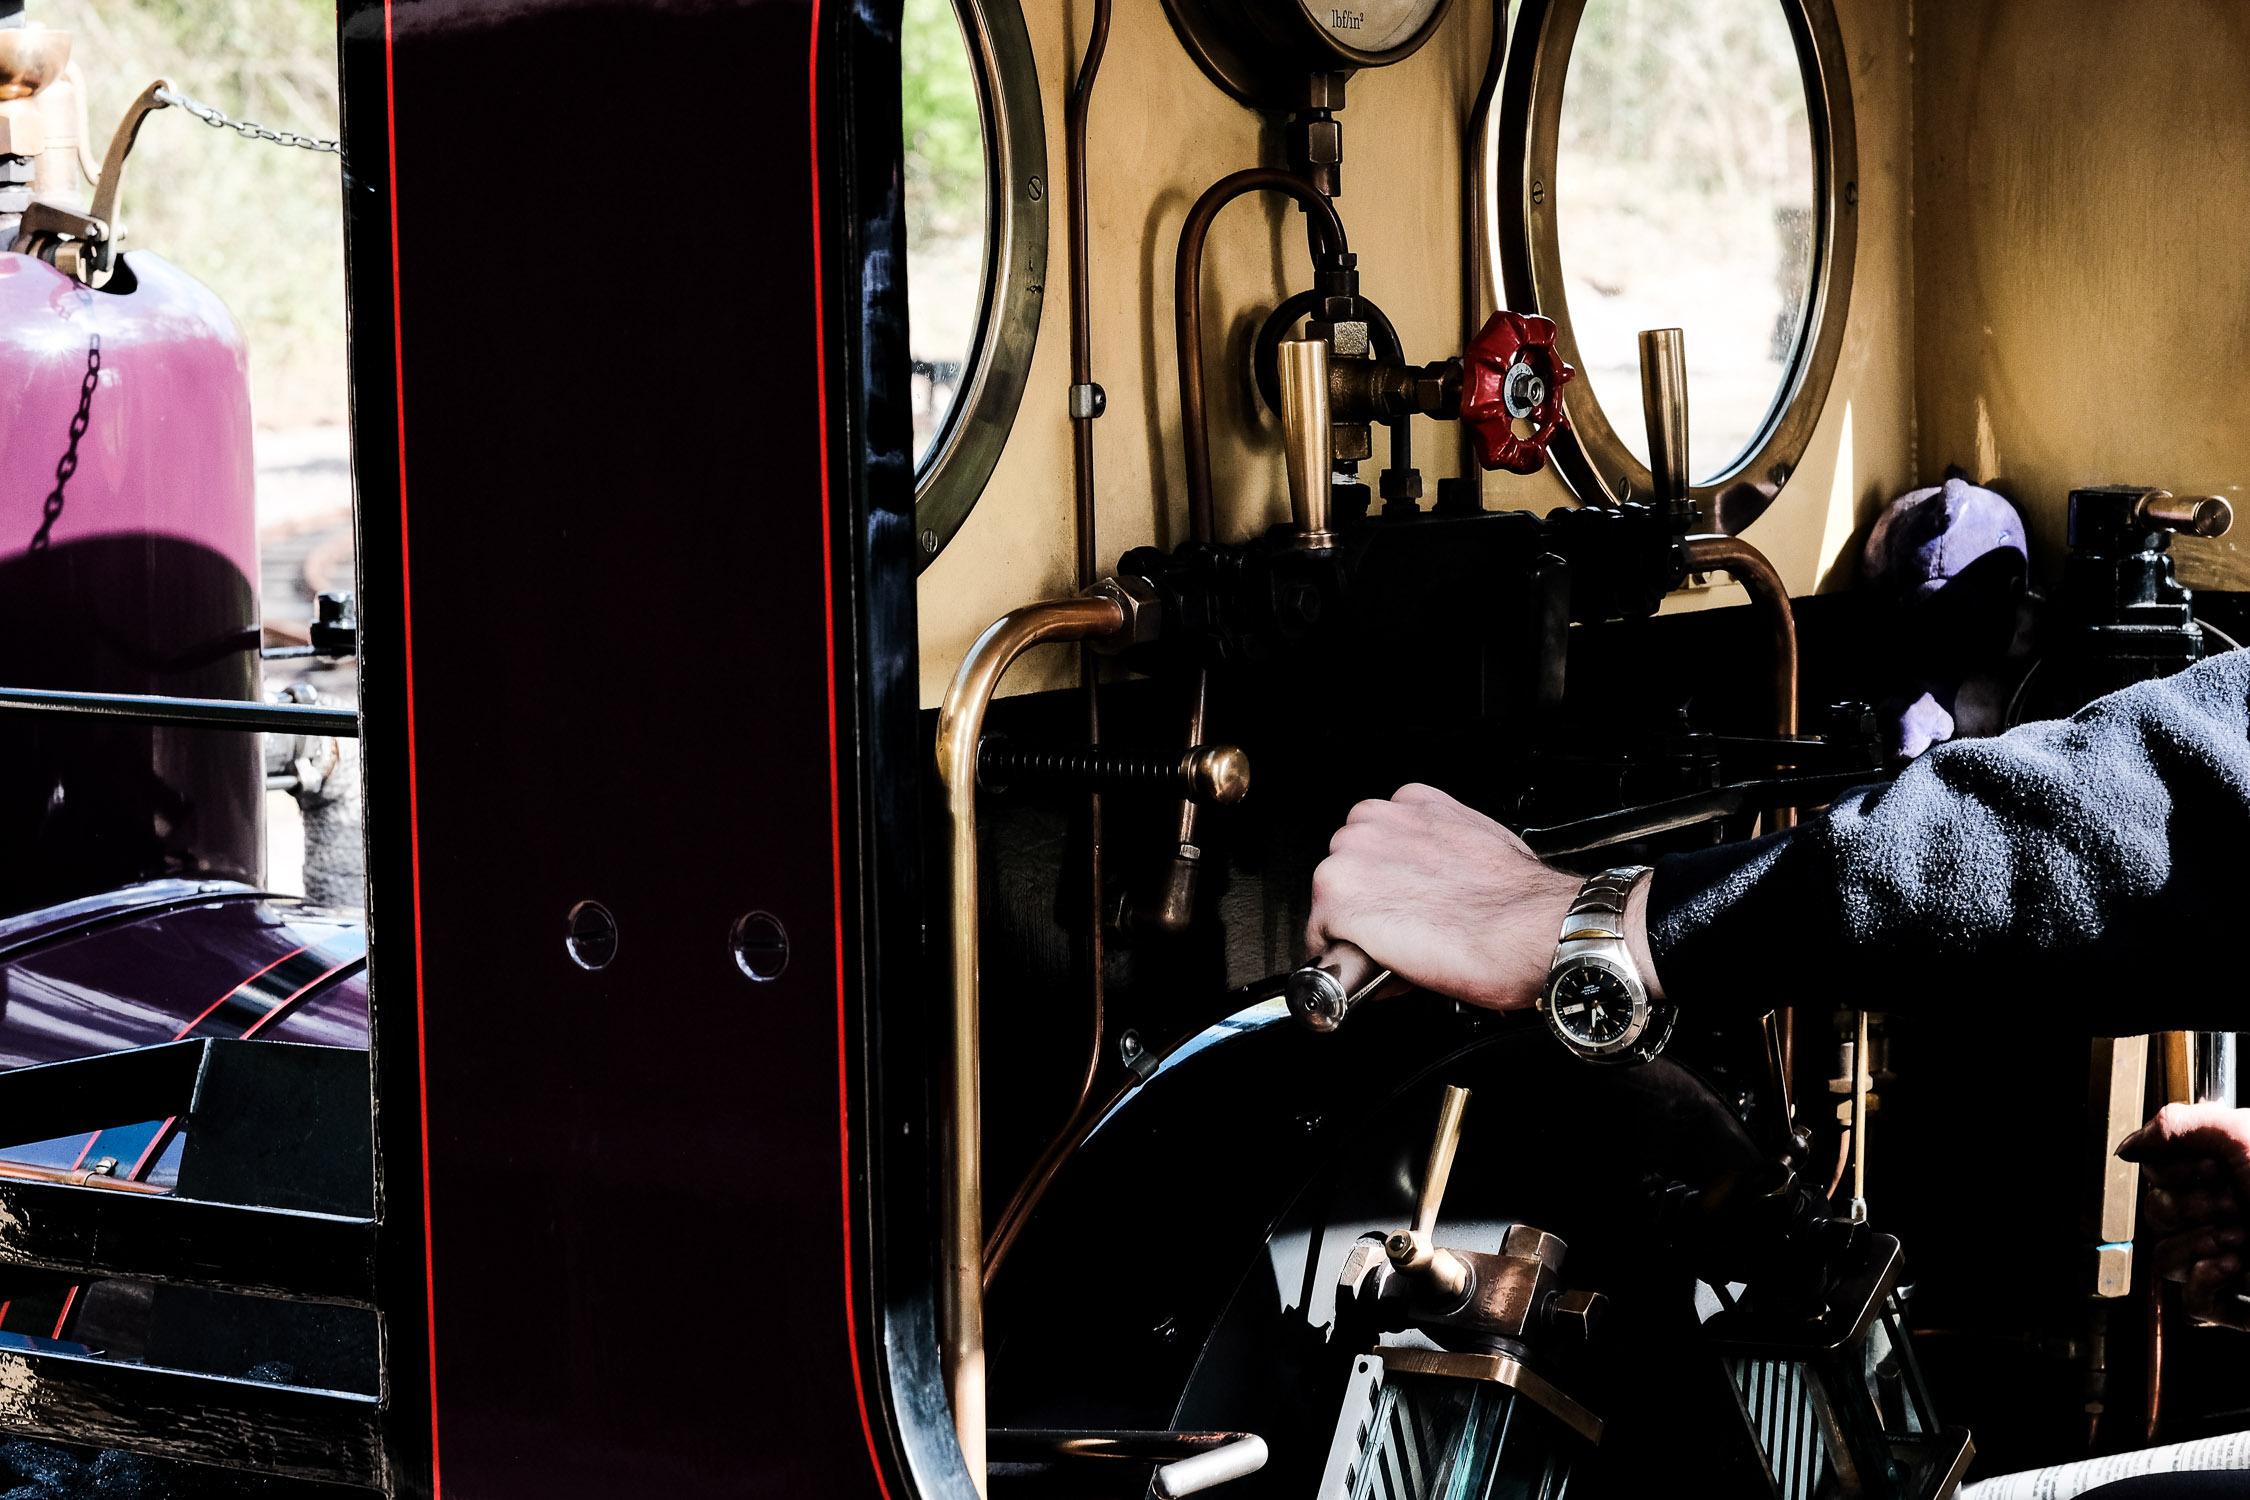 levers inside steam train cabin